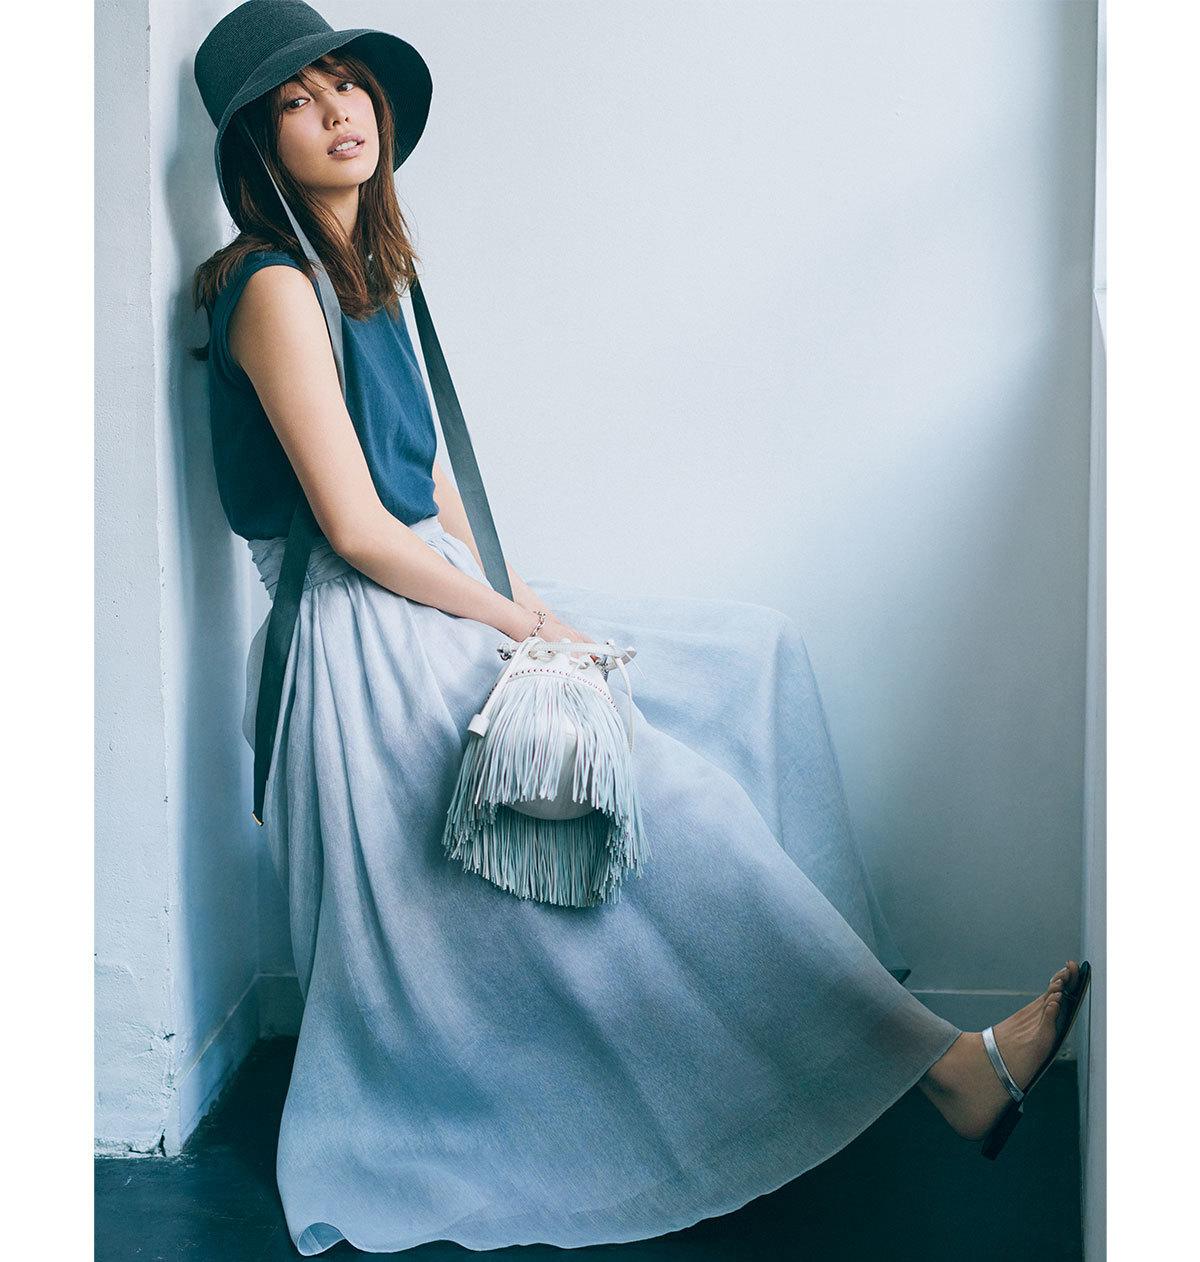 DUSTY BLACK T-Shirt BLUE GRAY Skirt ×ブルーグレーの淡め配色が今着たい大人フェミニンを体現